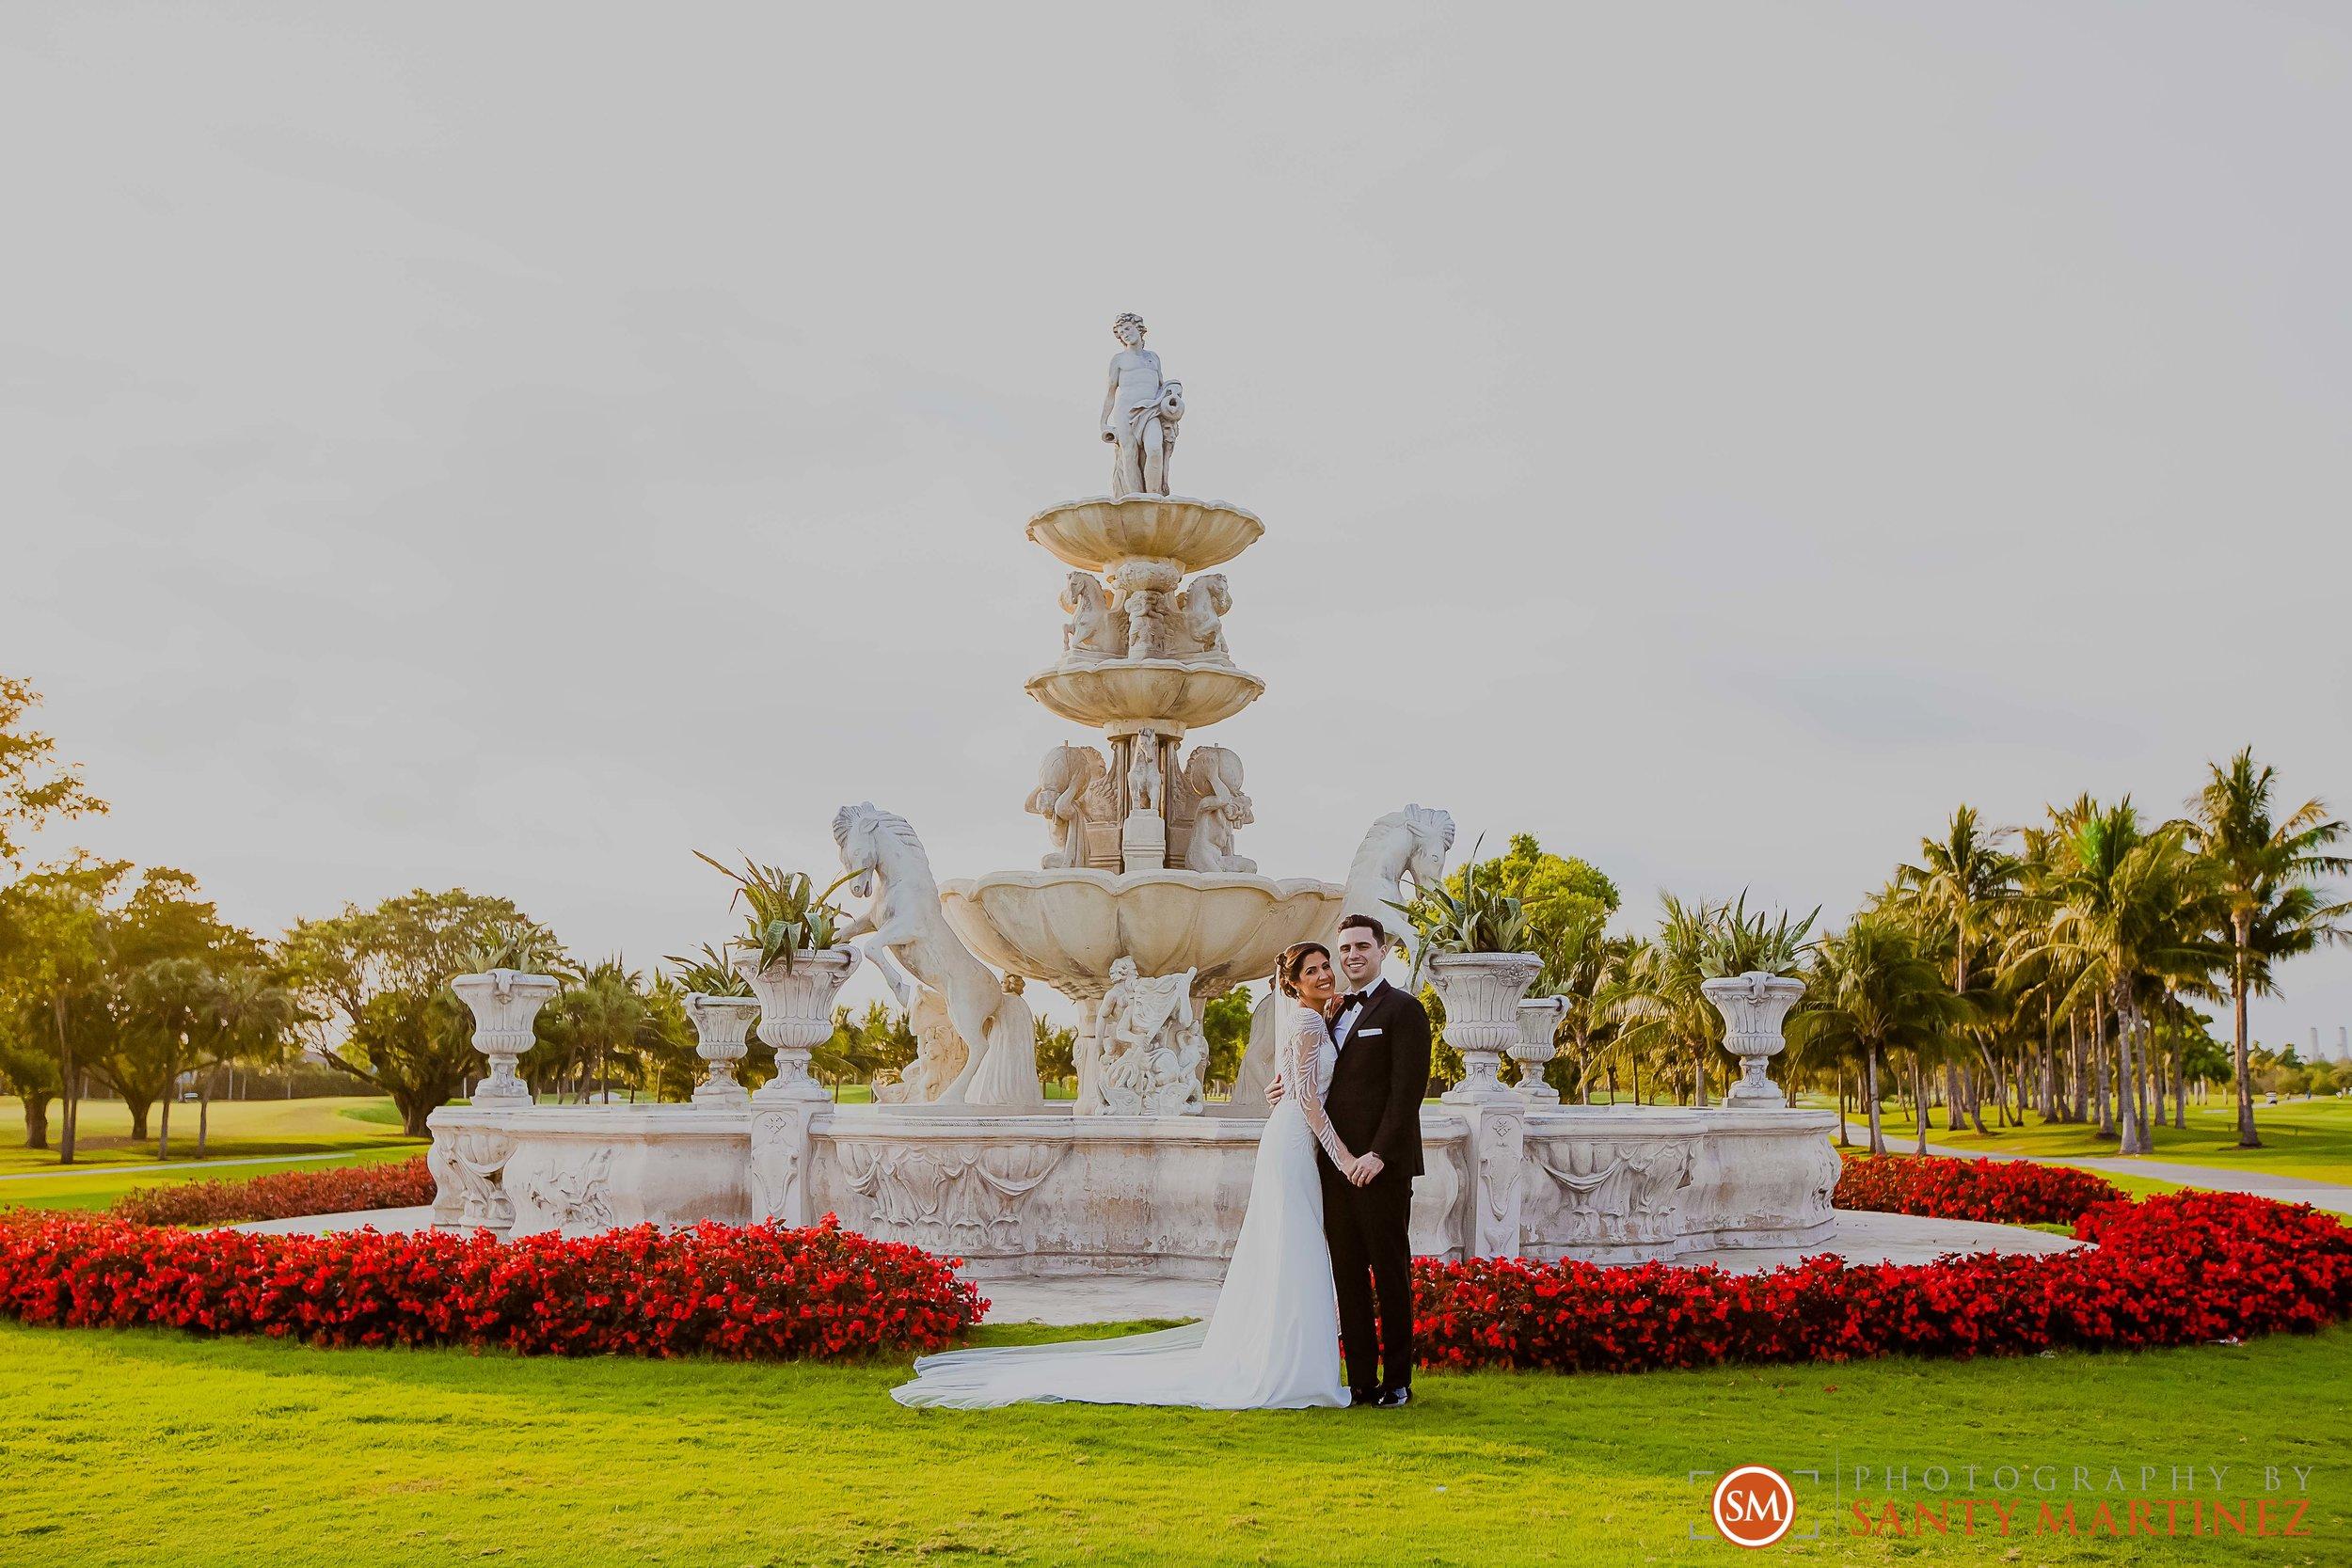 Wedding Trump National Doral Miami - Santy Martinez Photography-6.jpg